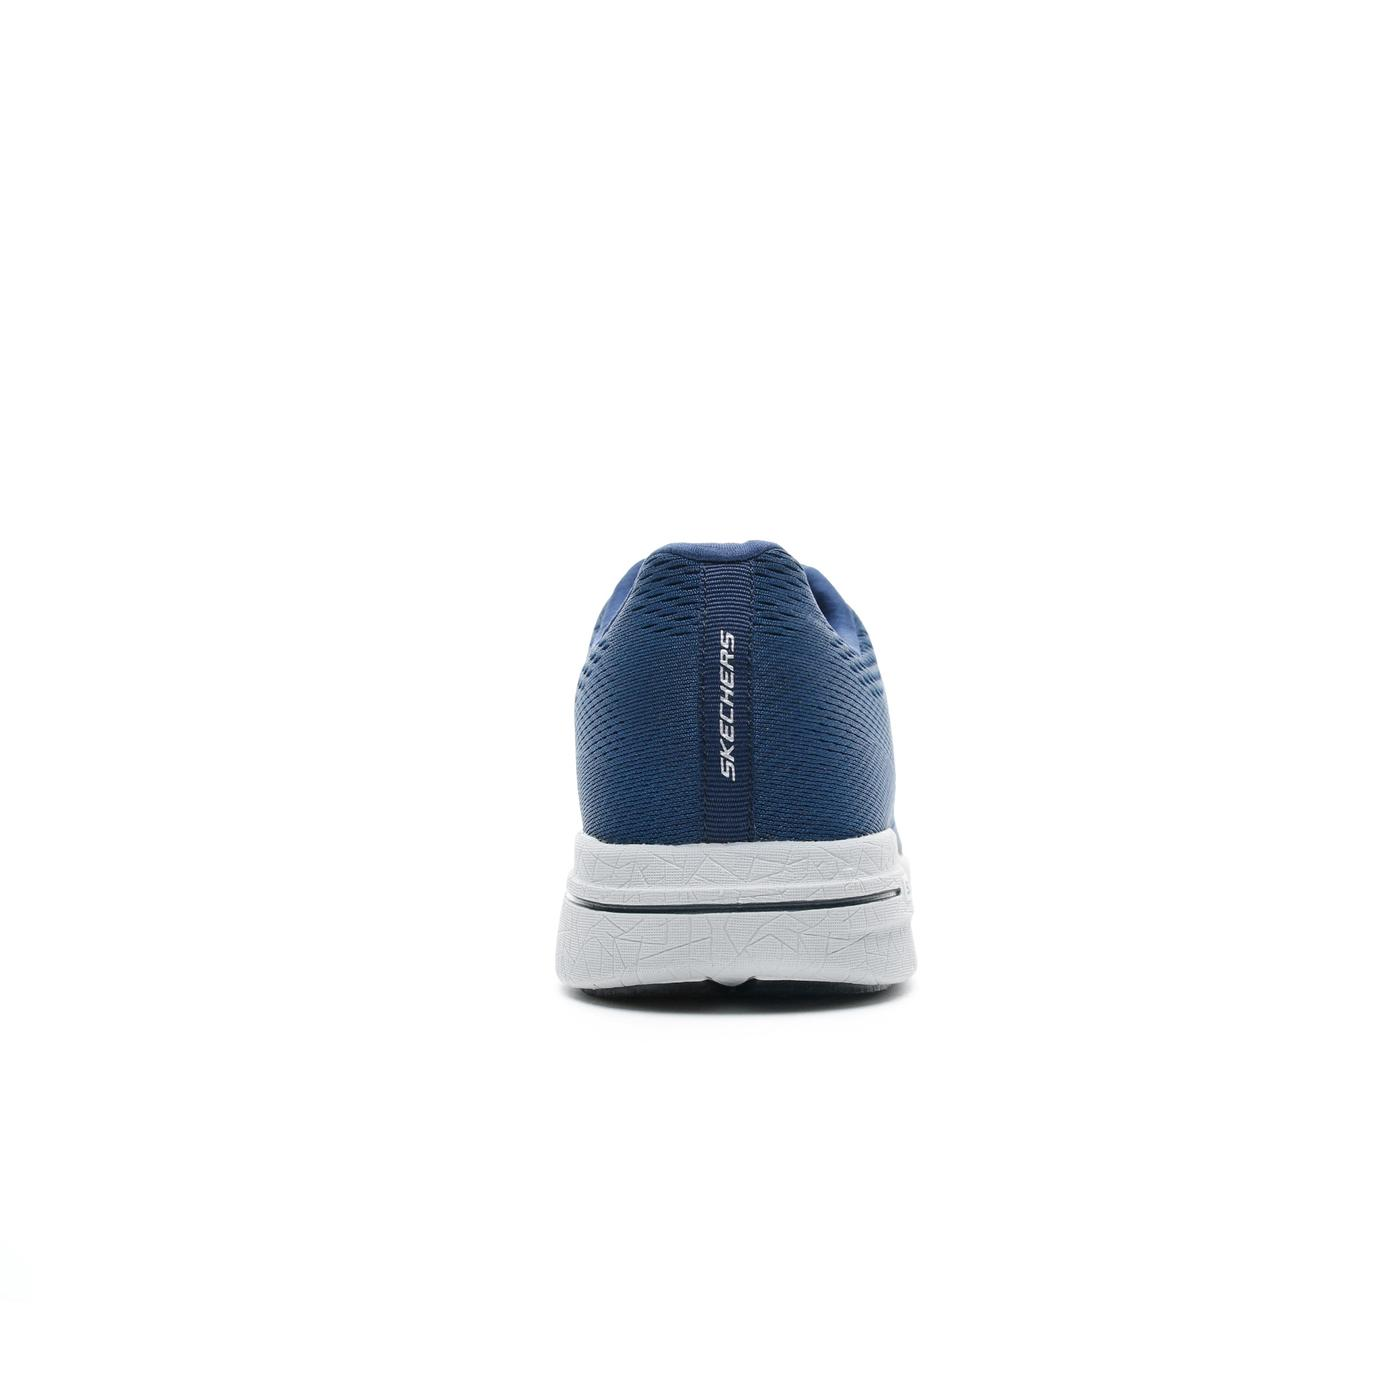 Skechers Burst 2.0-Out Of Range Erkek Lacivert-Gri Spor Ayakkabı